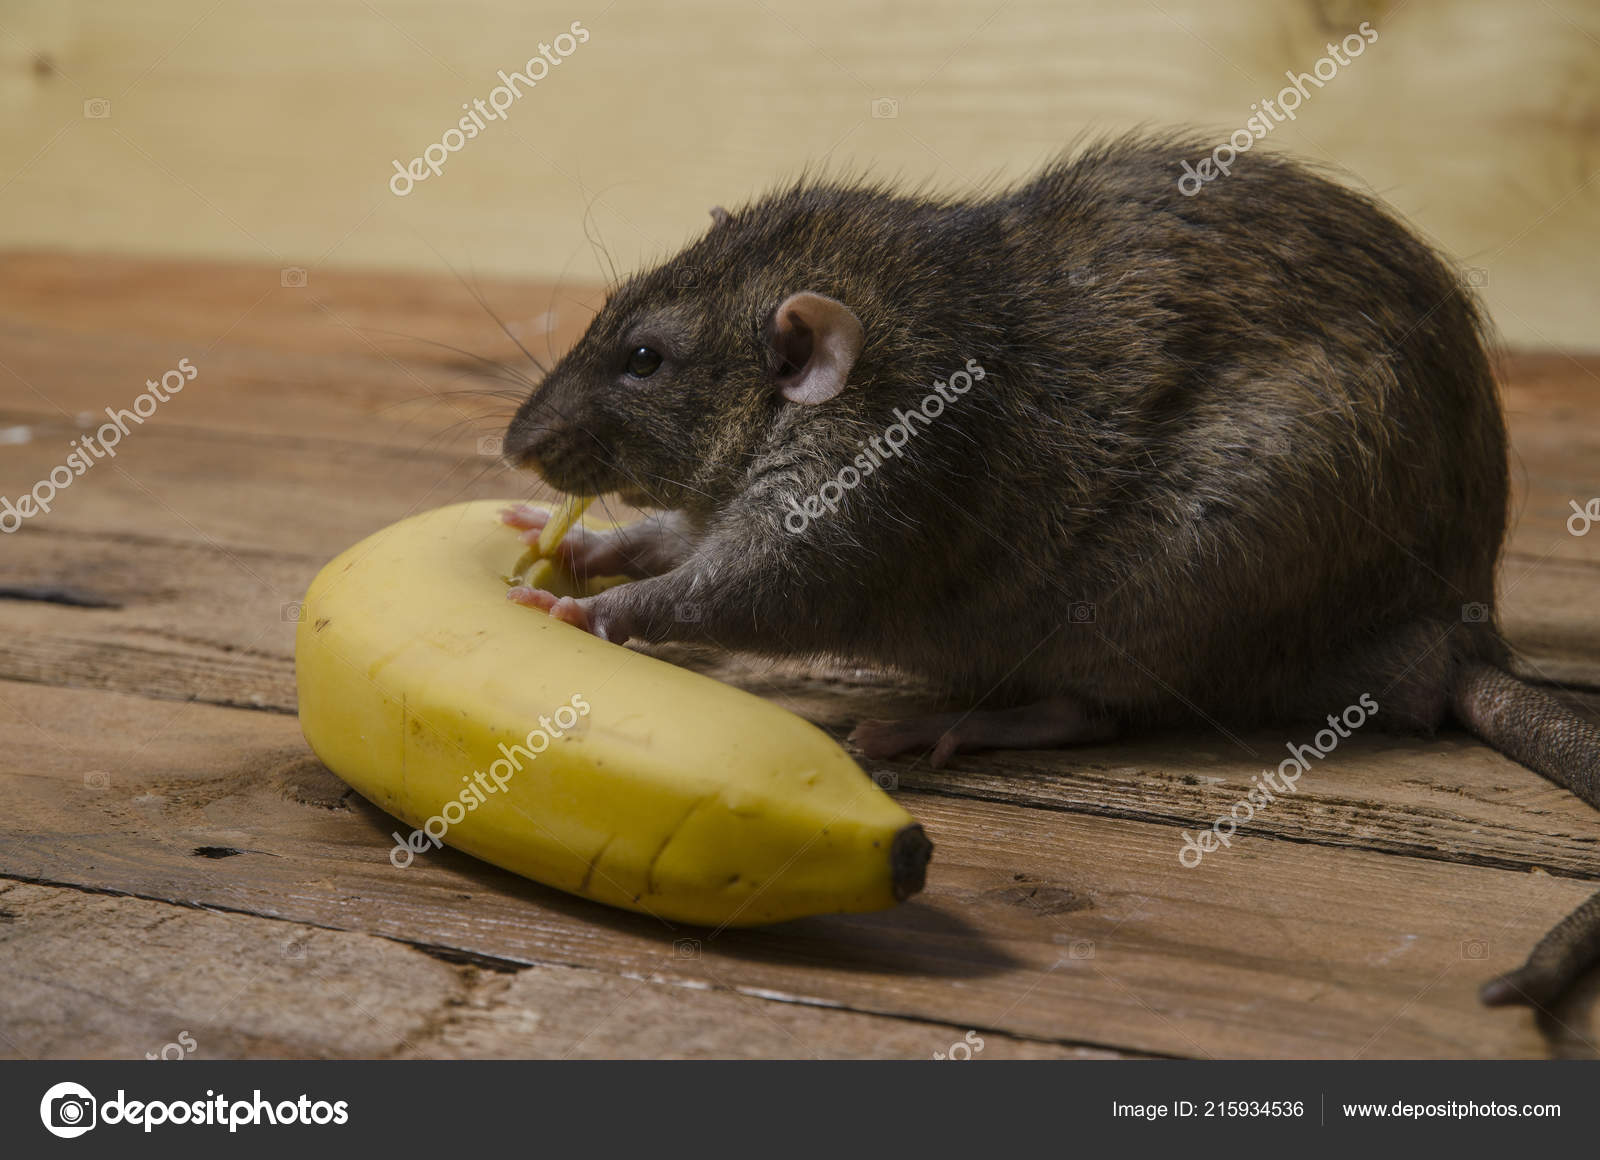 Banana On Table A rat is eating a banana on a wooden tableu2013 stock image